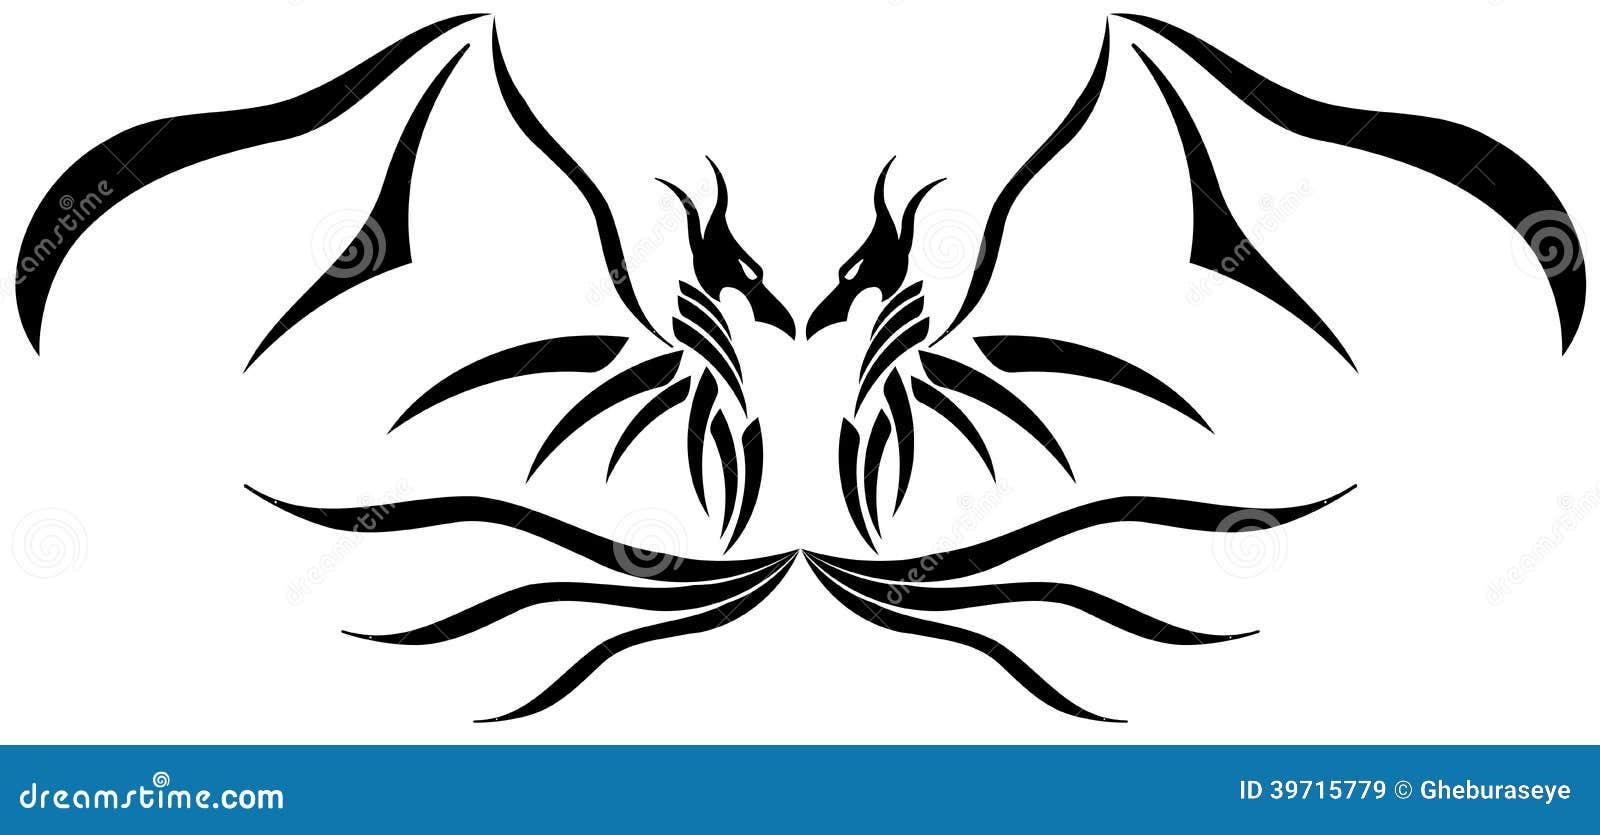 Tribal-Tattoos two-headed-dragon-tattoo-dragons-usable-tattoos-39715779